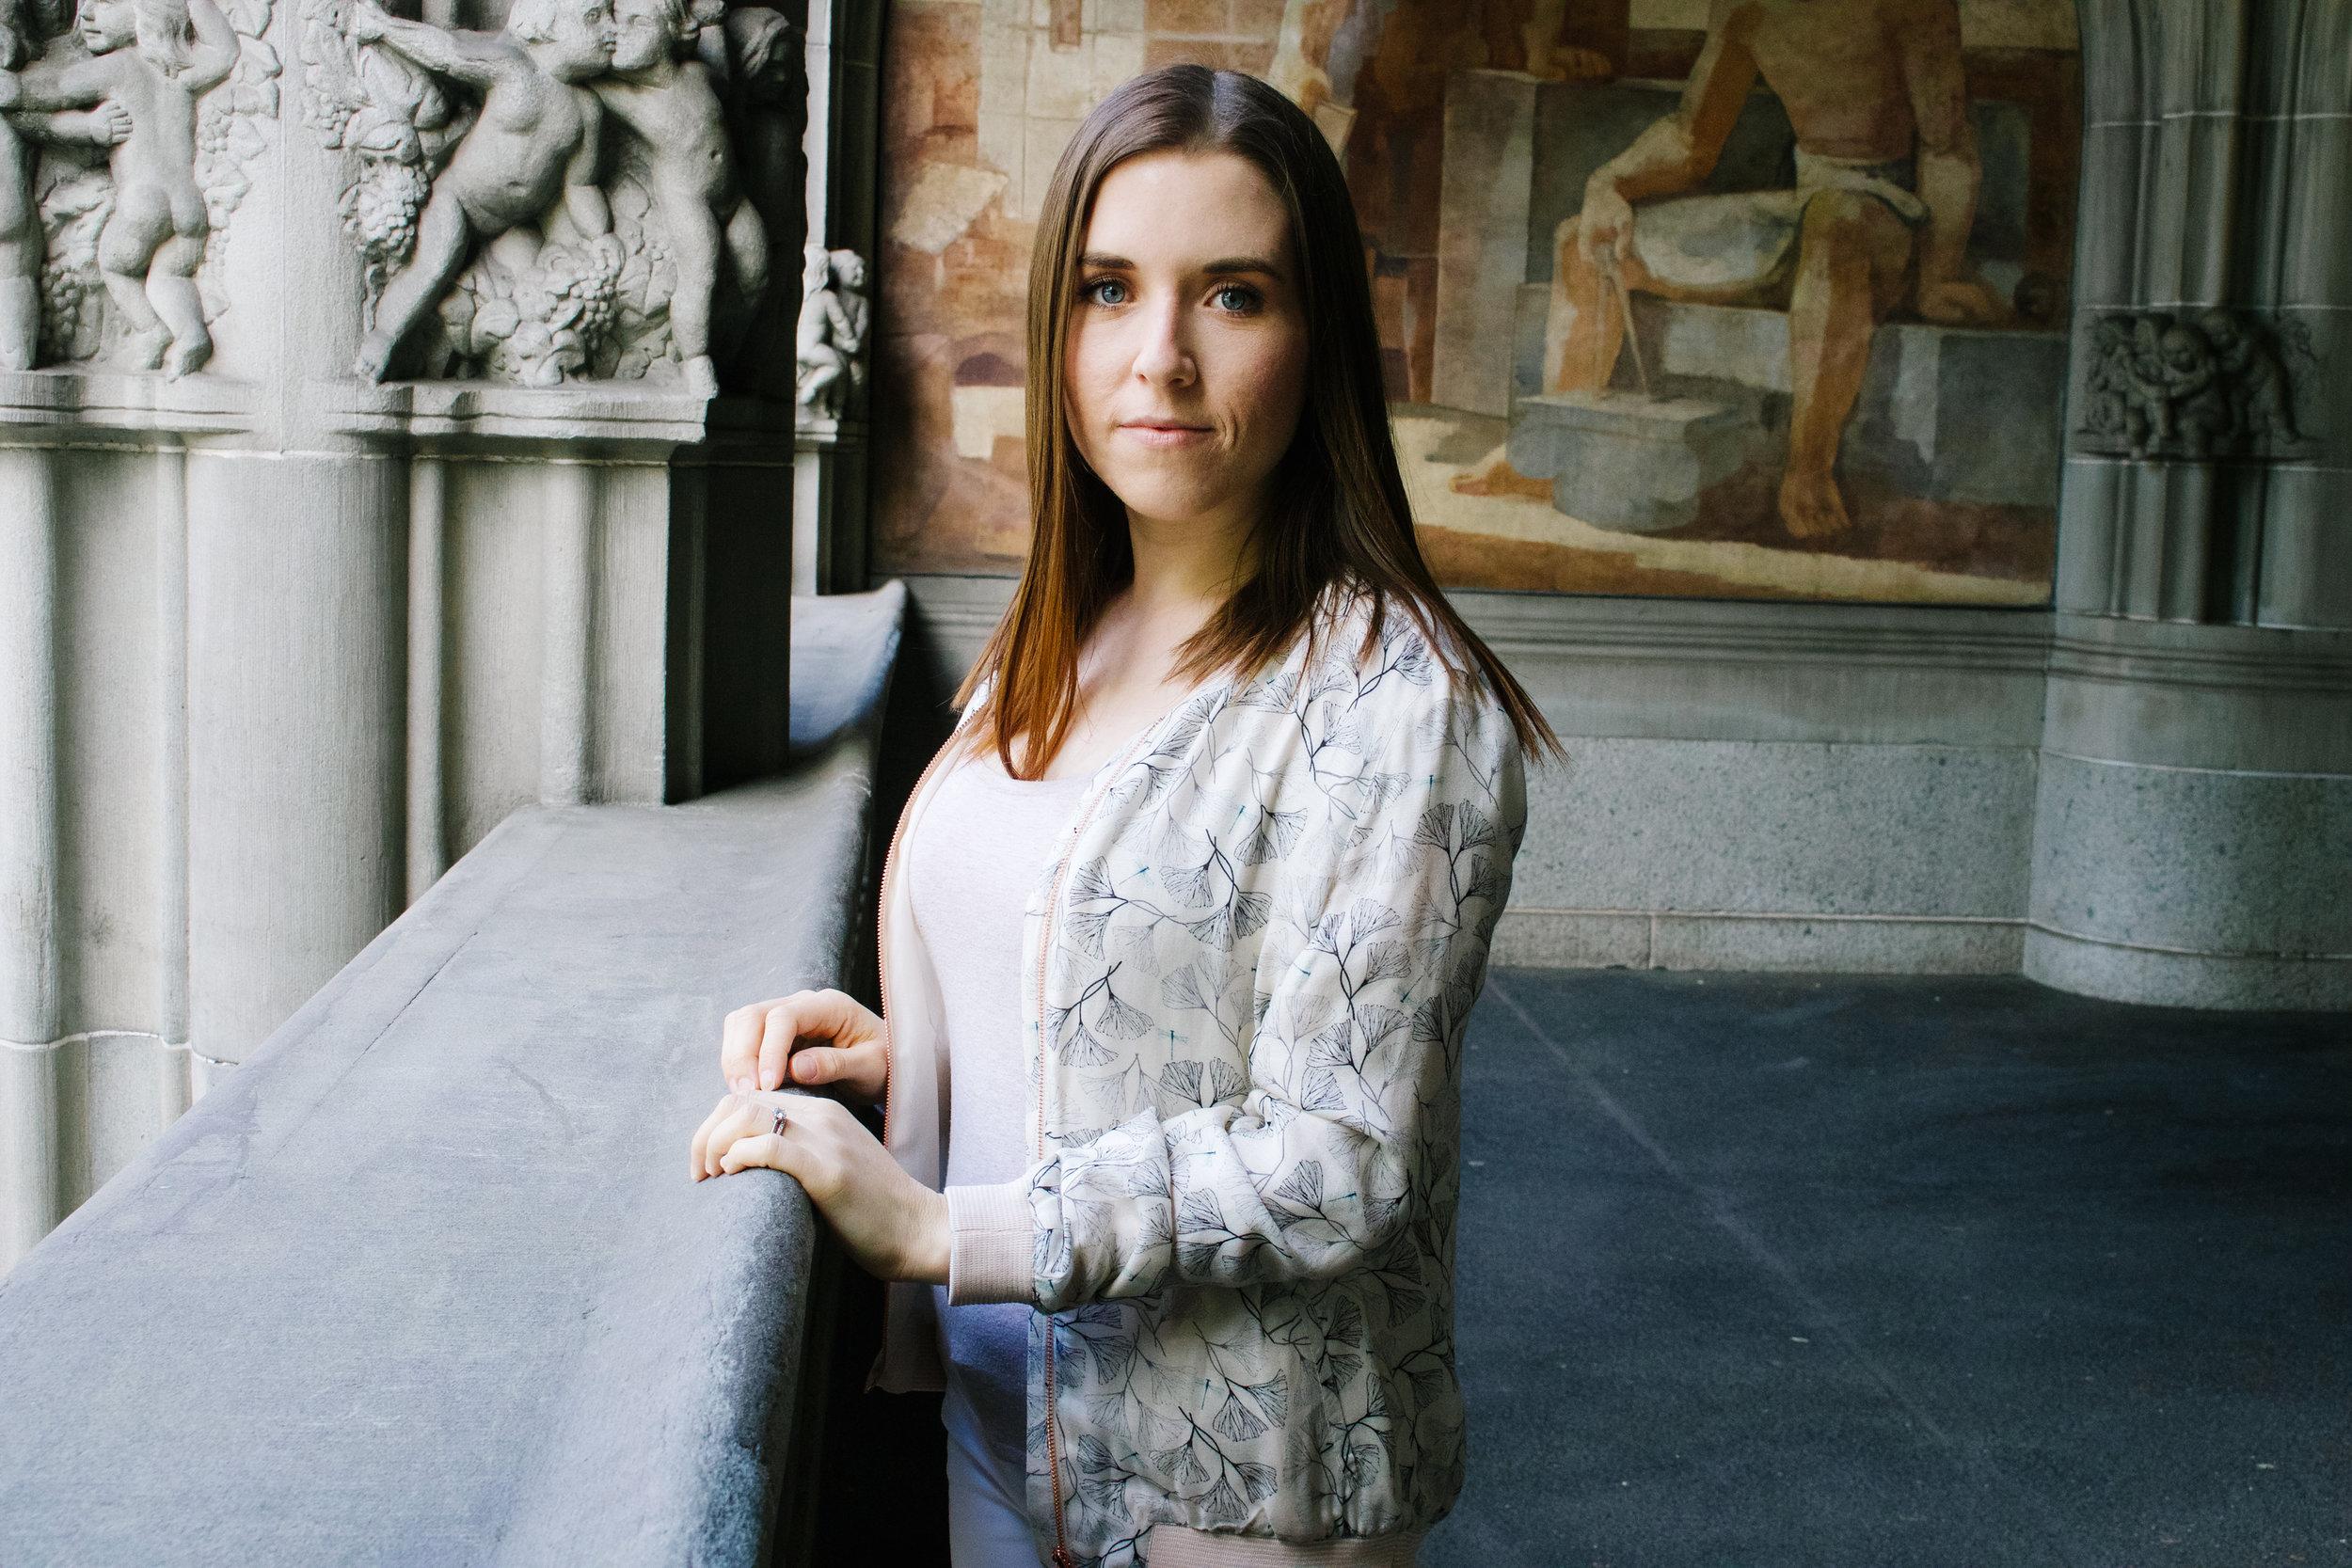 FrancescaPhillips